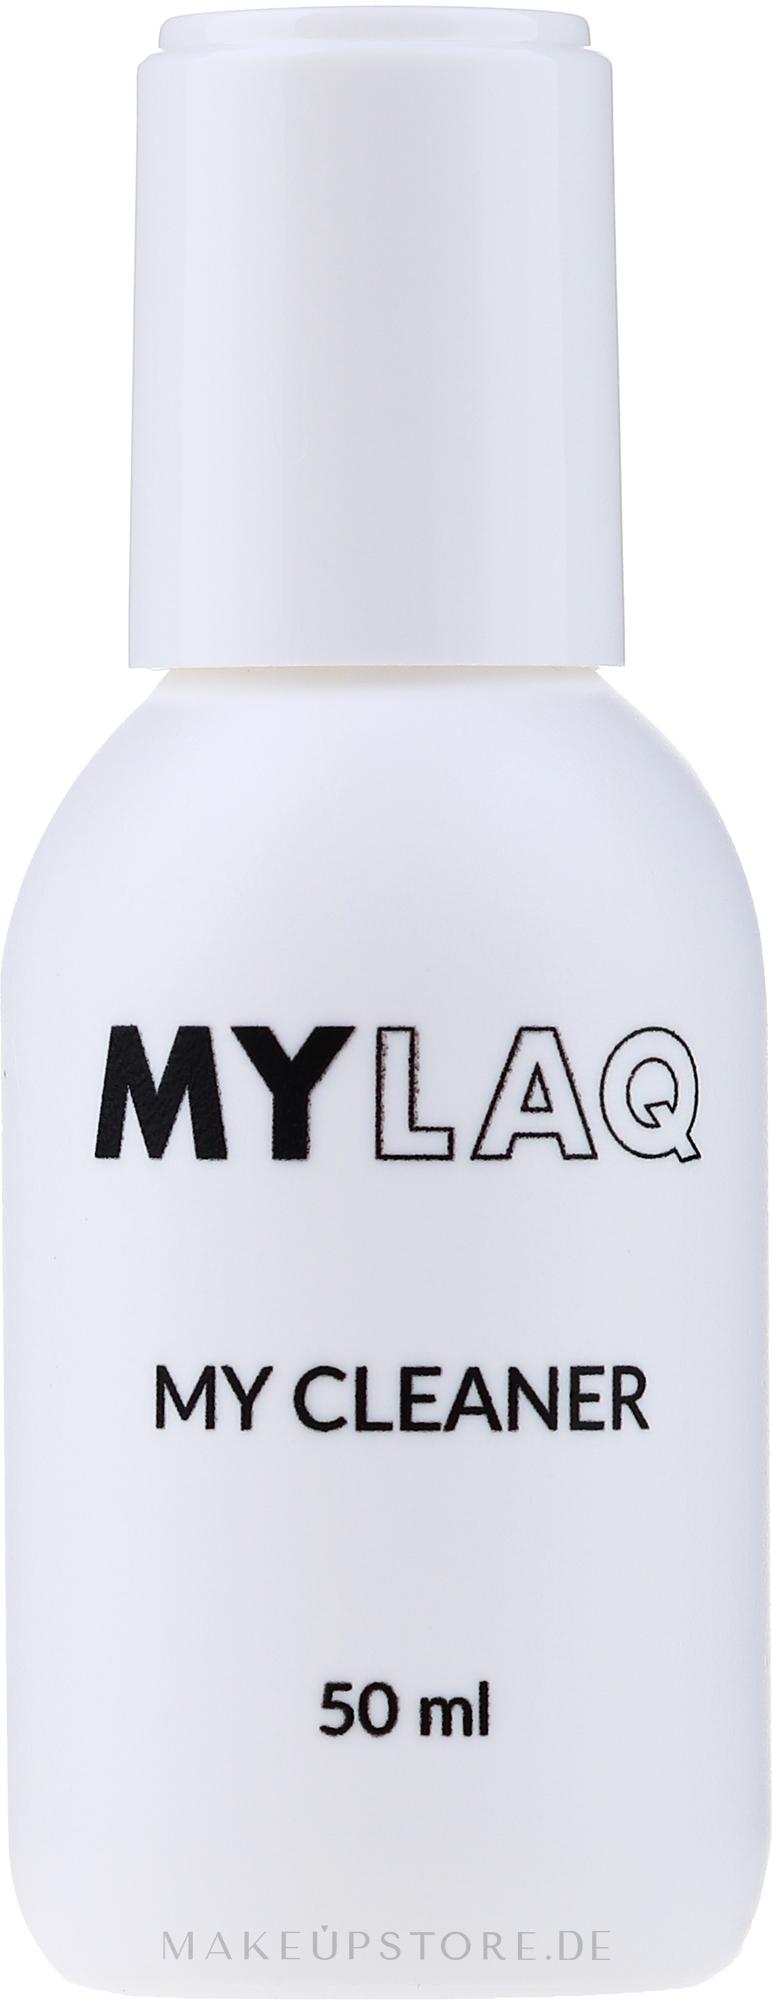 Nagelentfetter - MylaQ My Cleaner — Bild 50 ml